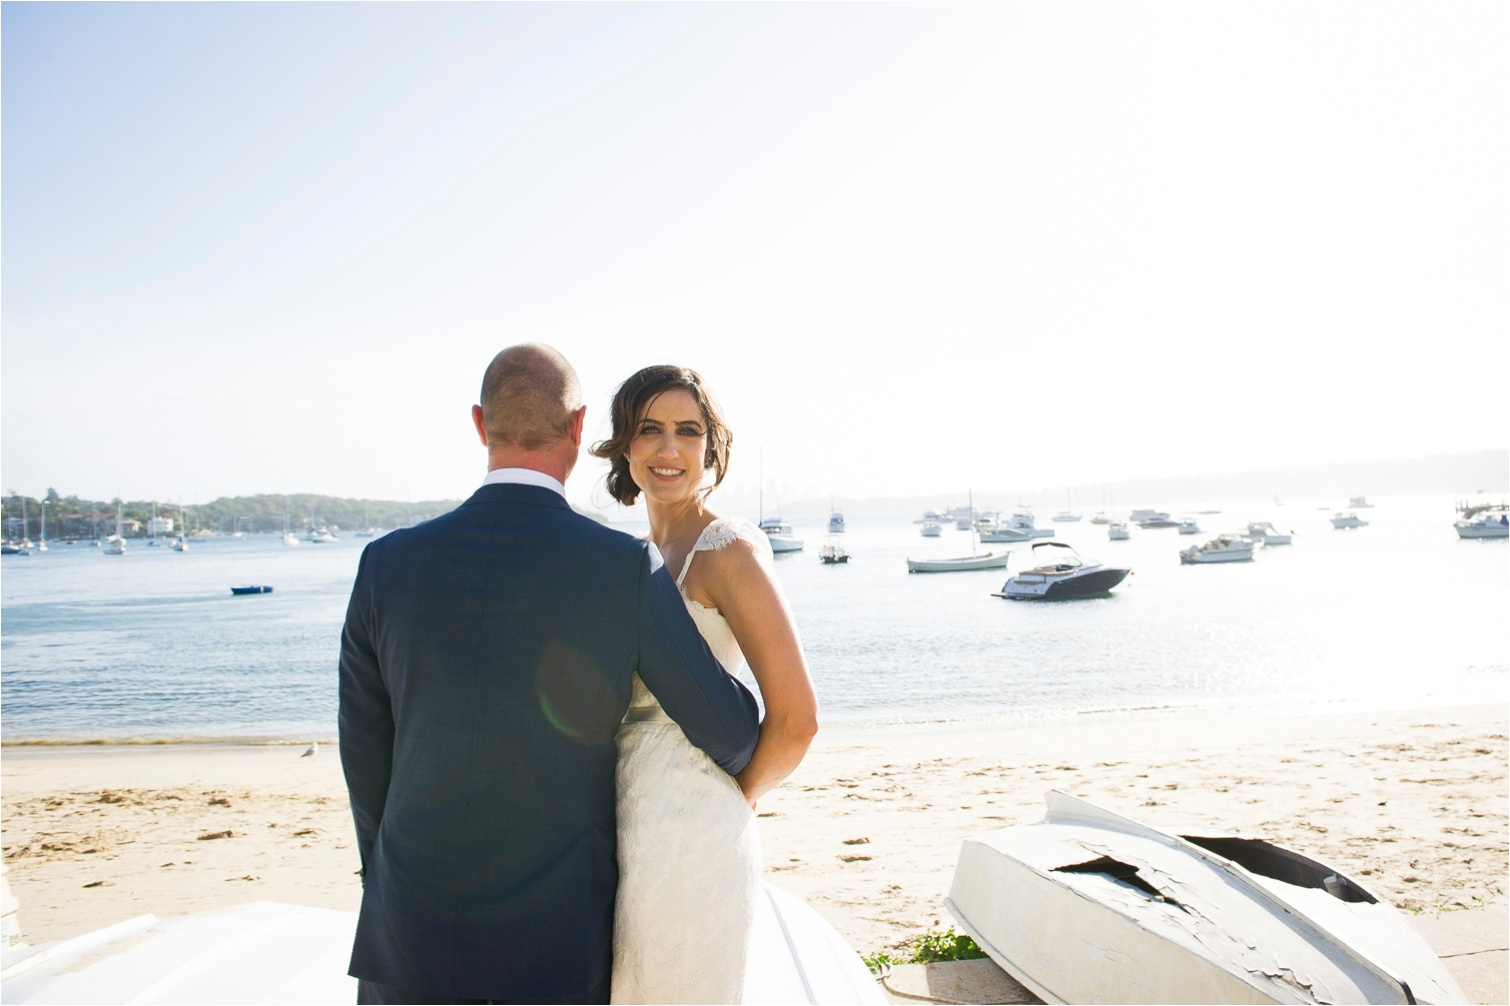 Nicole&Carlie_Watsons_Bay_Hotel_Wedding_by_Gold_Coast_Photographers-The_Follans40.jpg